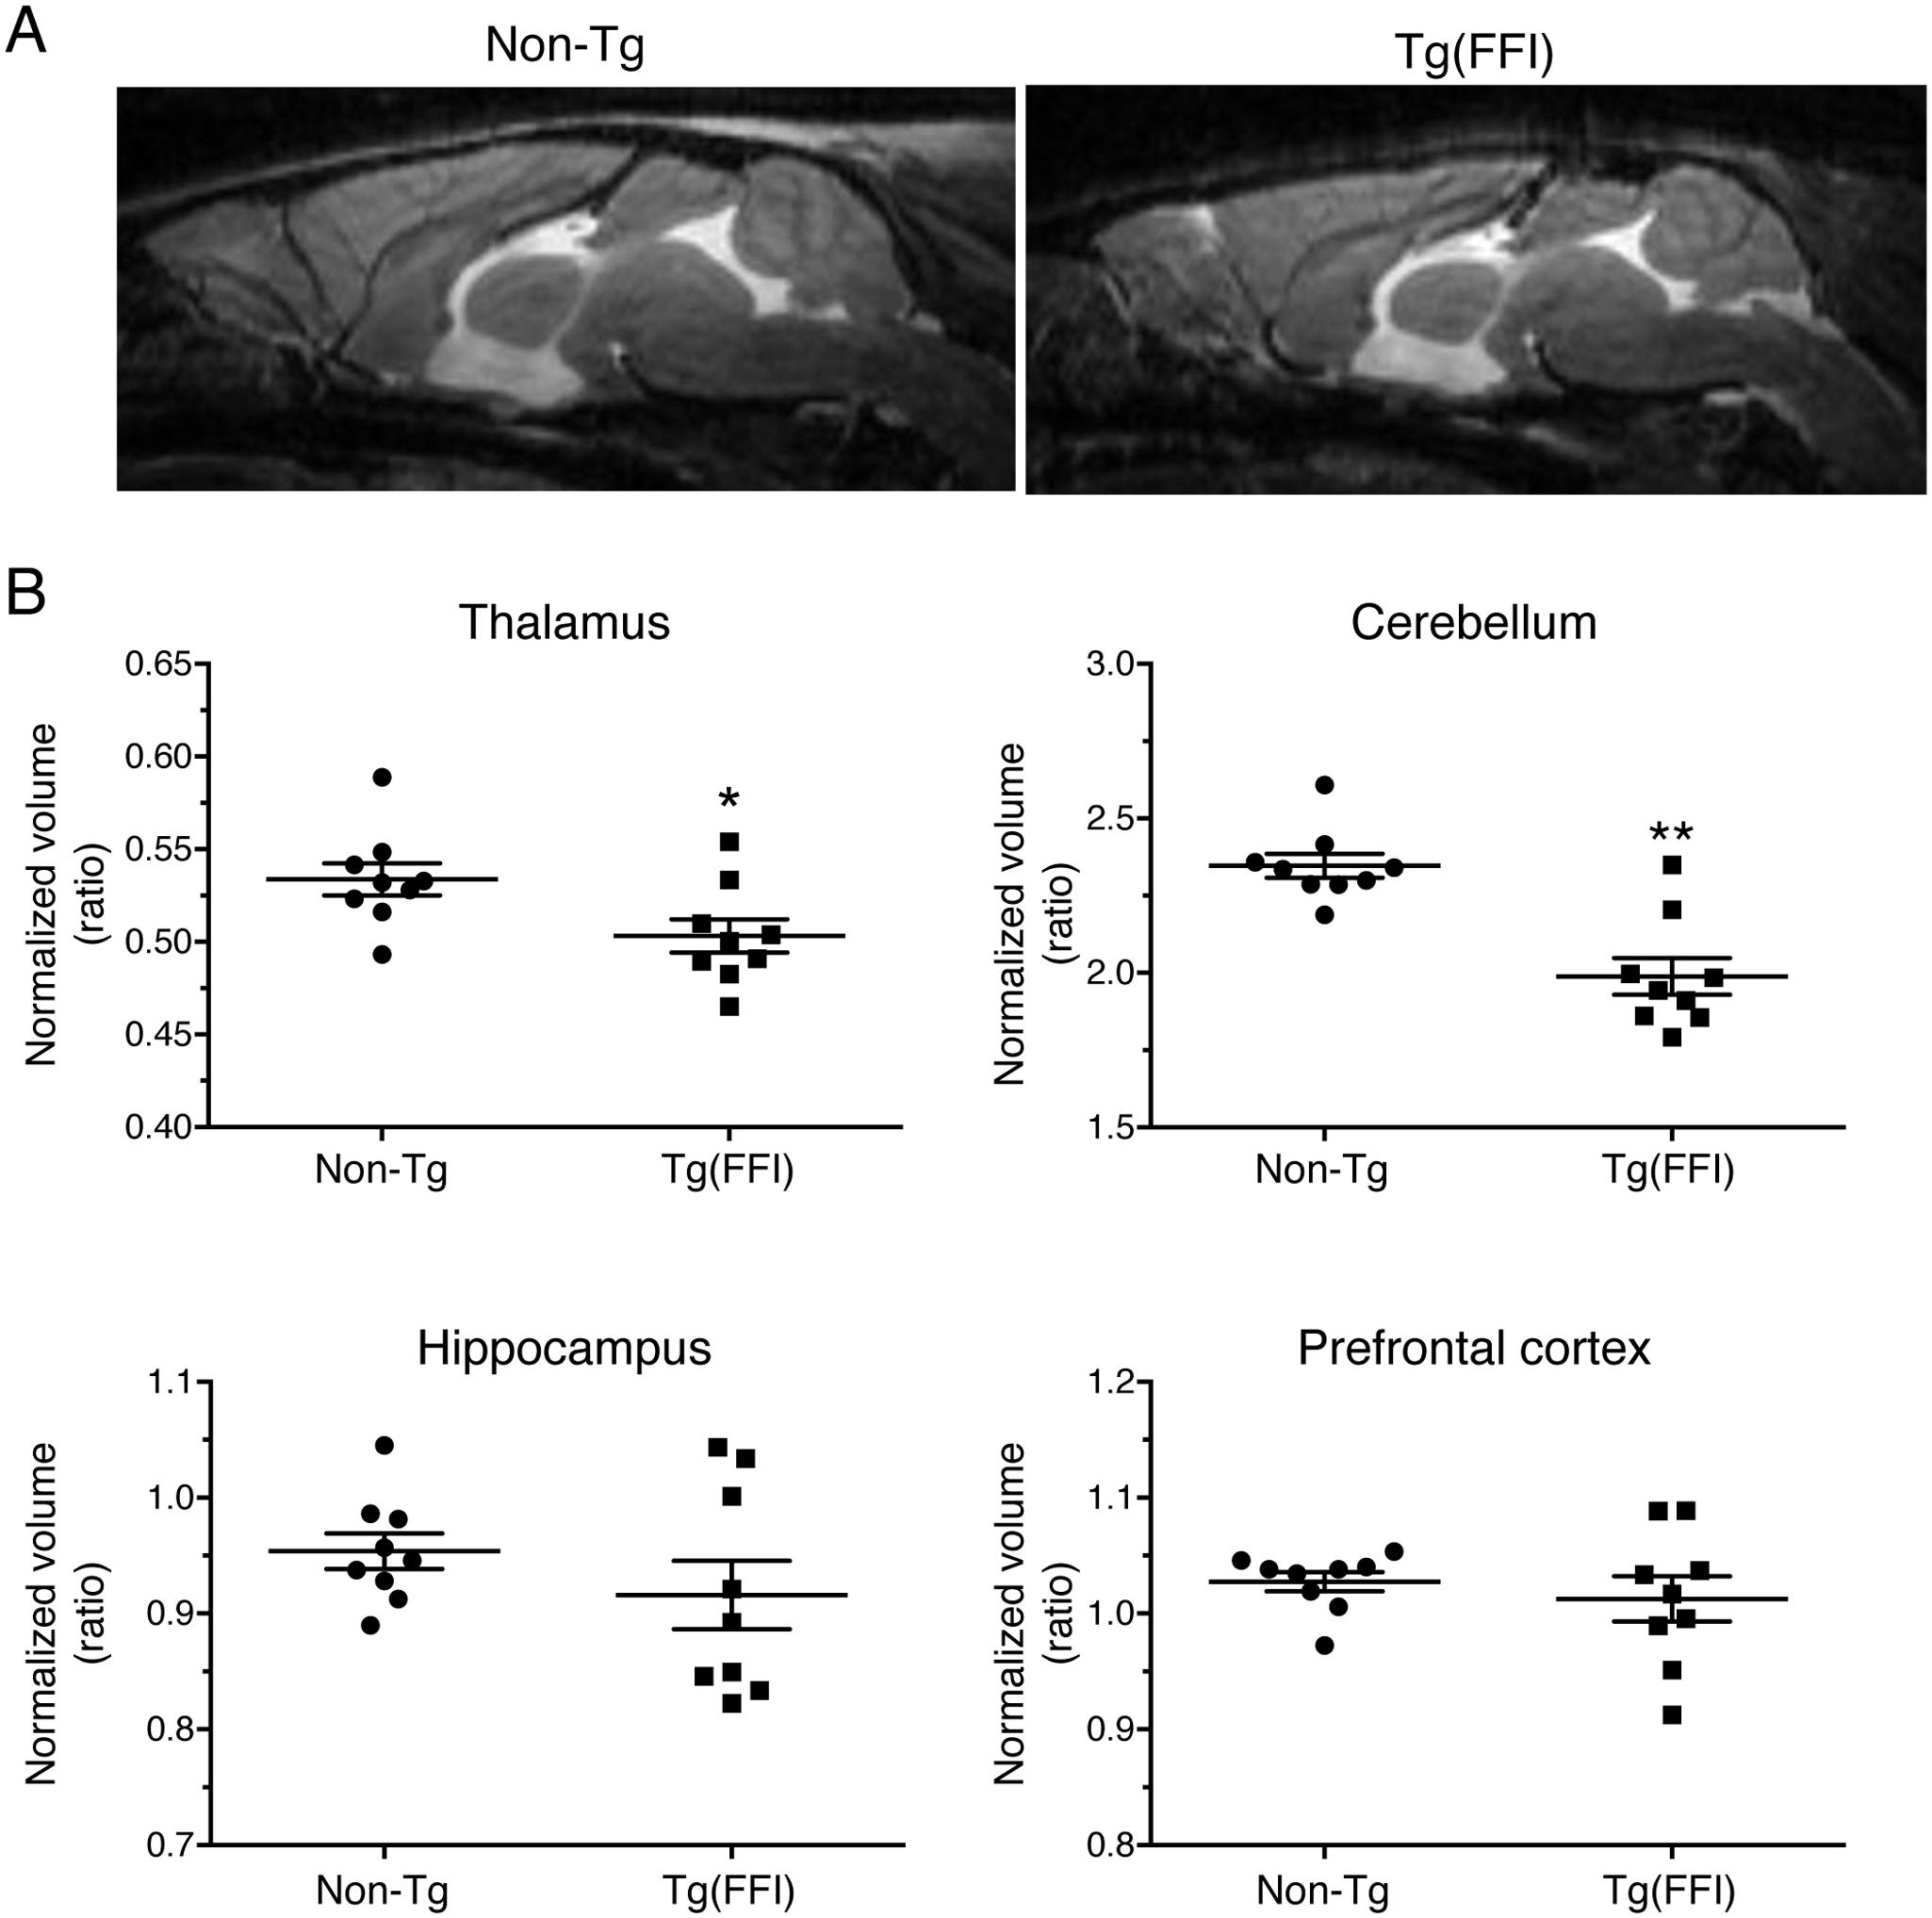 Tg(FFI) mice show thalamic and cerebellar atrophy.